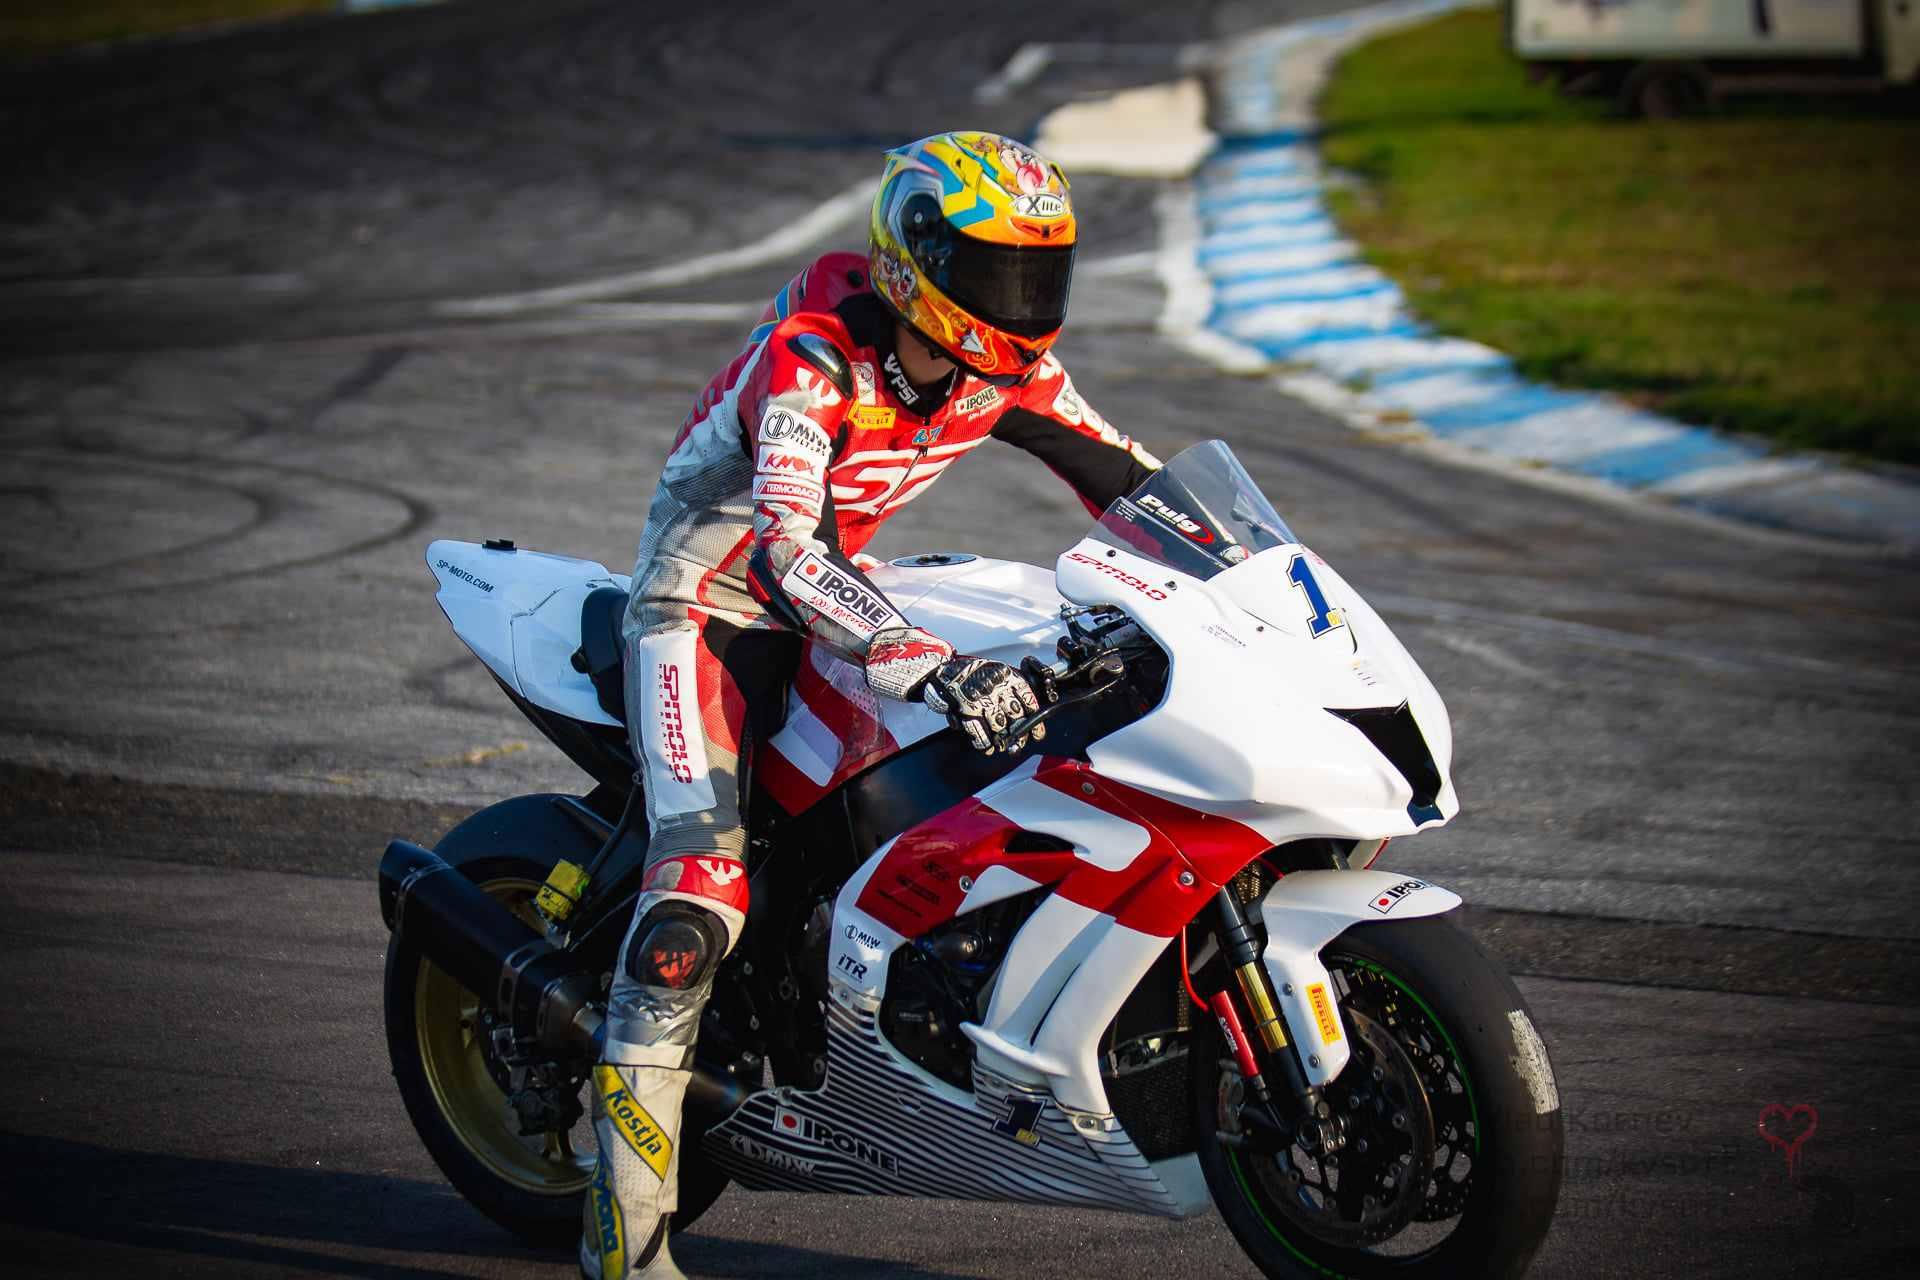 5-6_etap_MotoGPUkraine_070